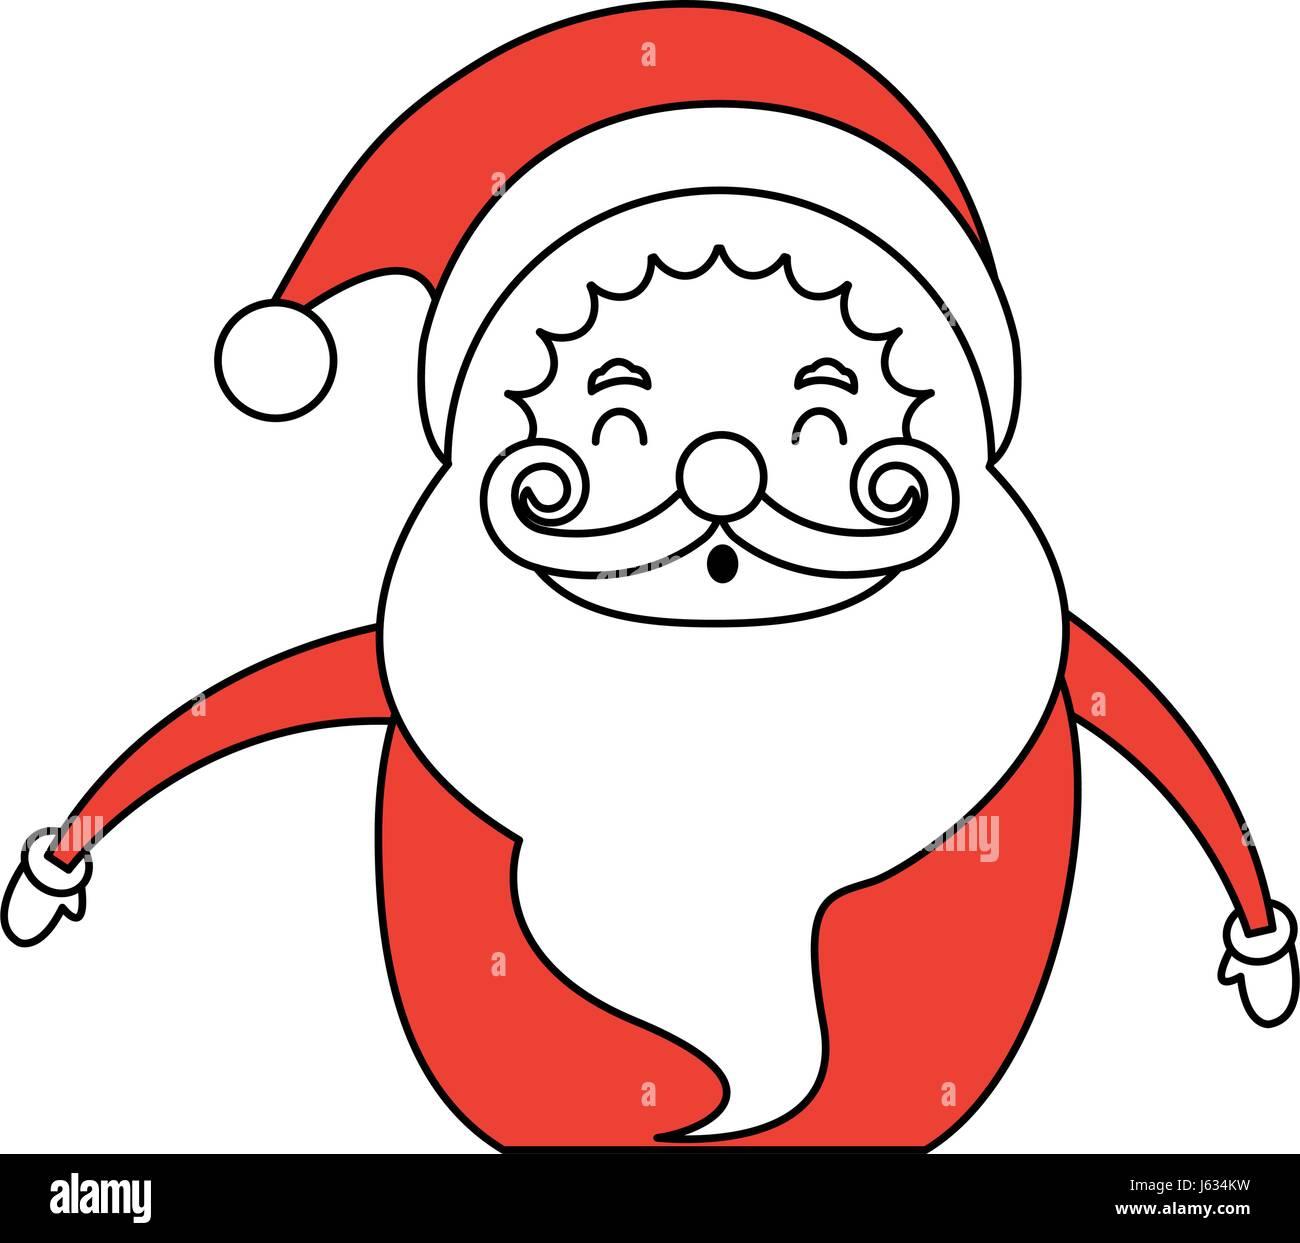 color silhouette image cartoon half body fat santa claus smiling - Pictures Of Santa Claus To Color